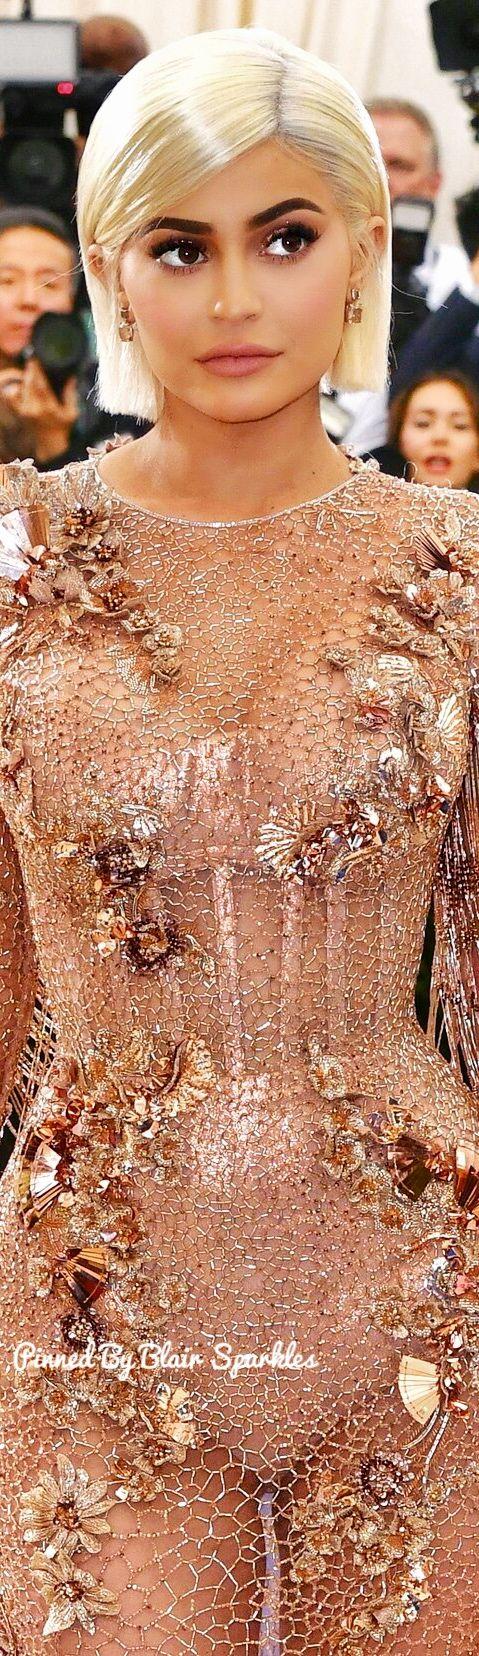 Kylie Jenner at Met Gala 2017 ♕♚εїз | BLAIR SPARKLES |